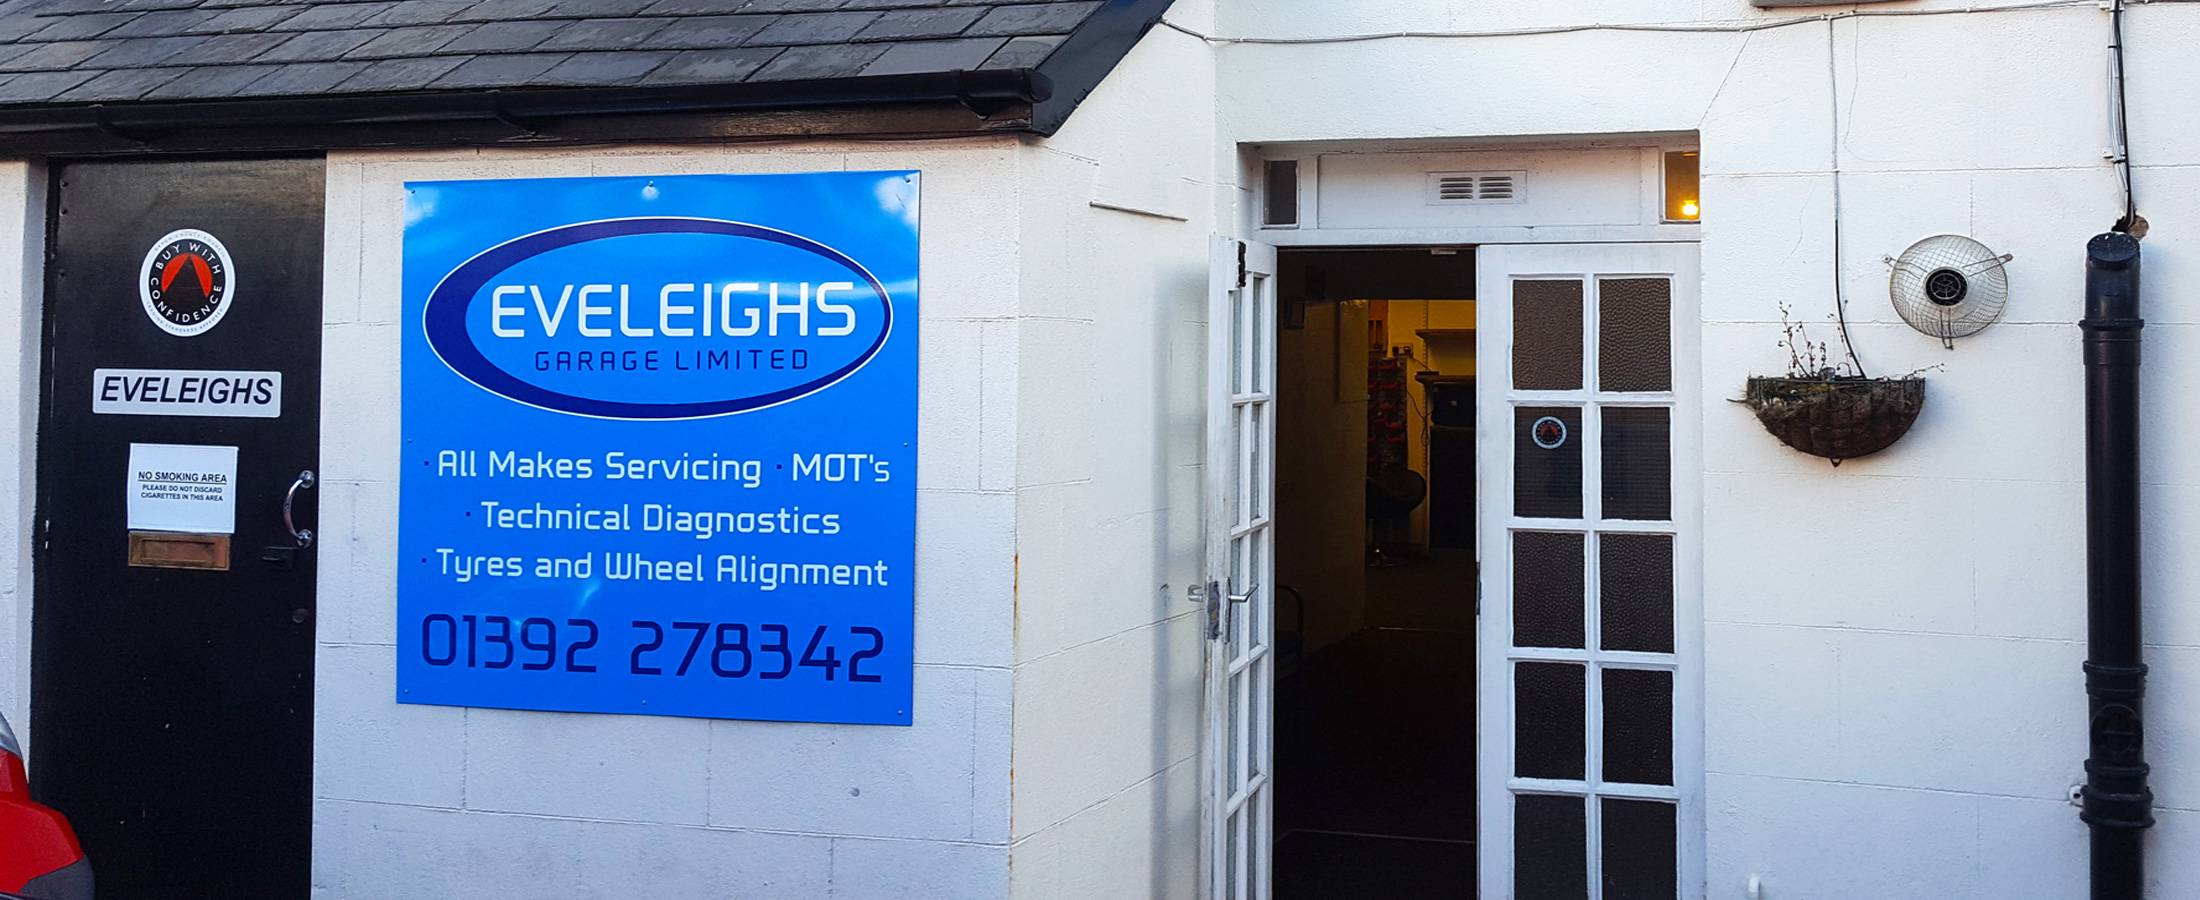 eveleighs garage entrance reception cropped